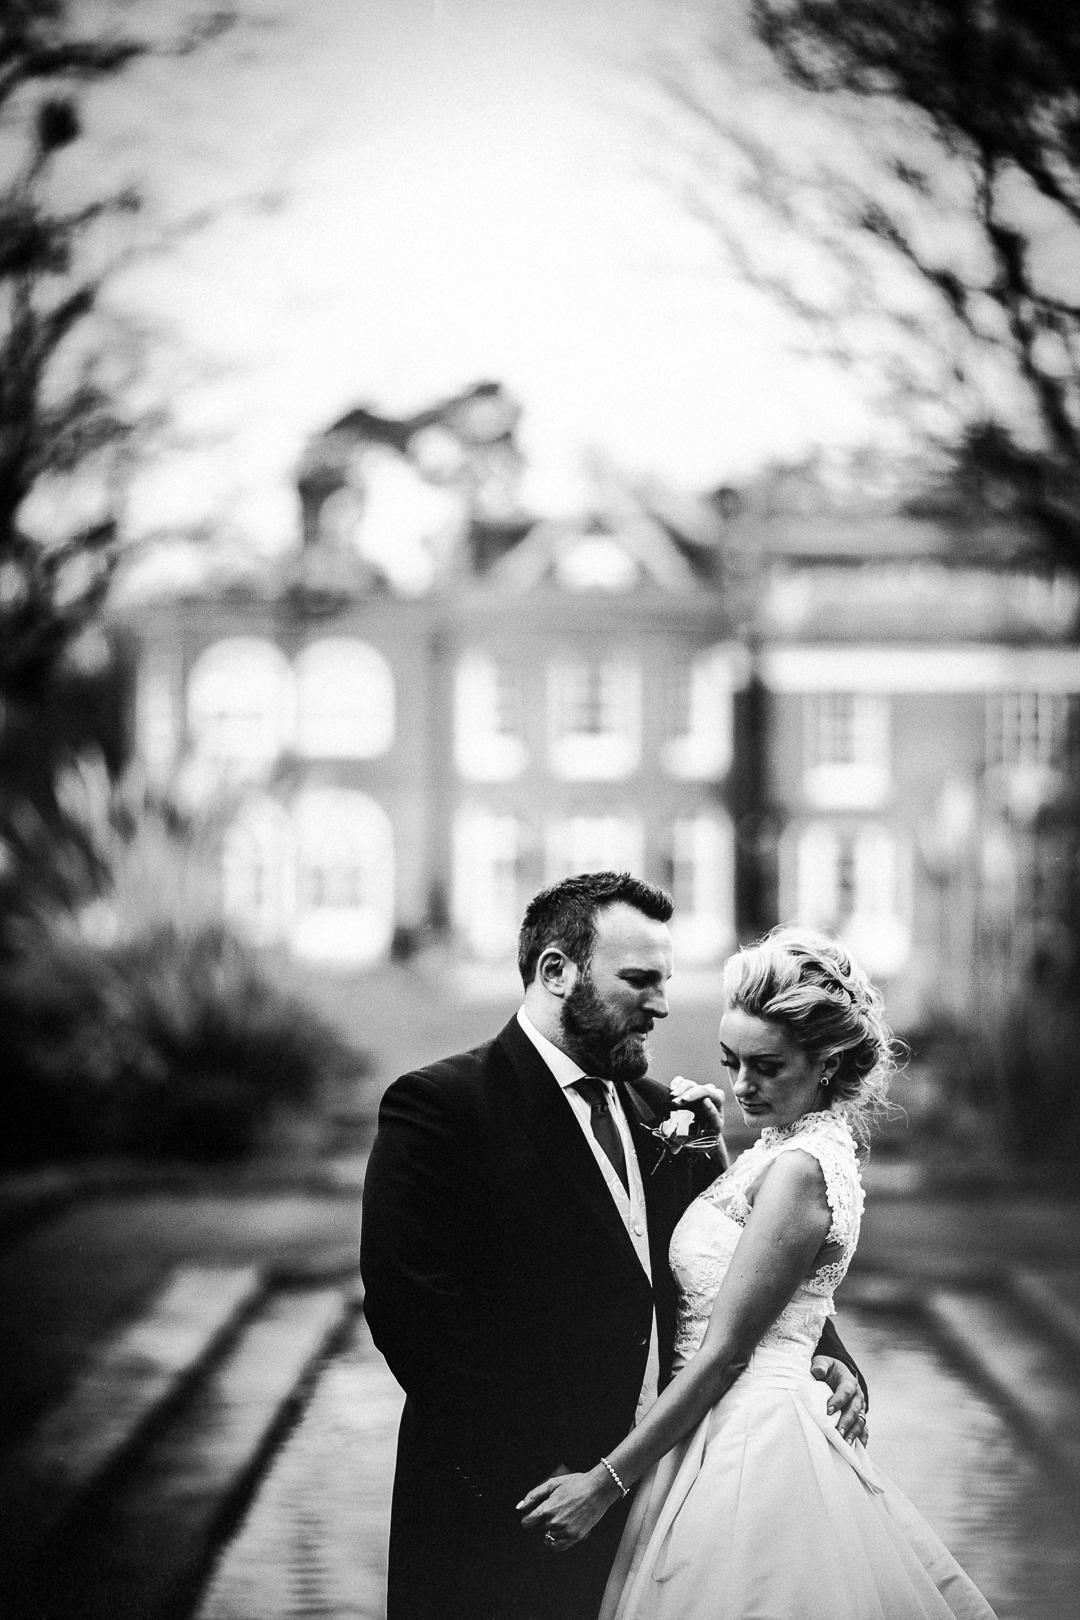 alternative wedding photographey-2-2